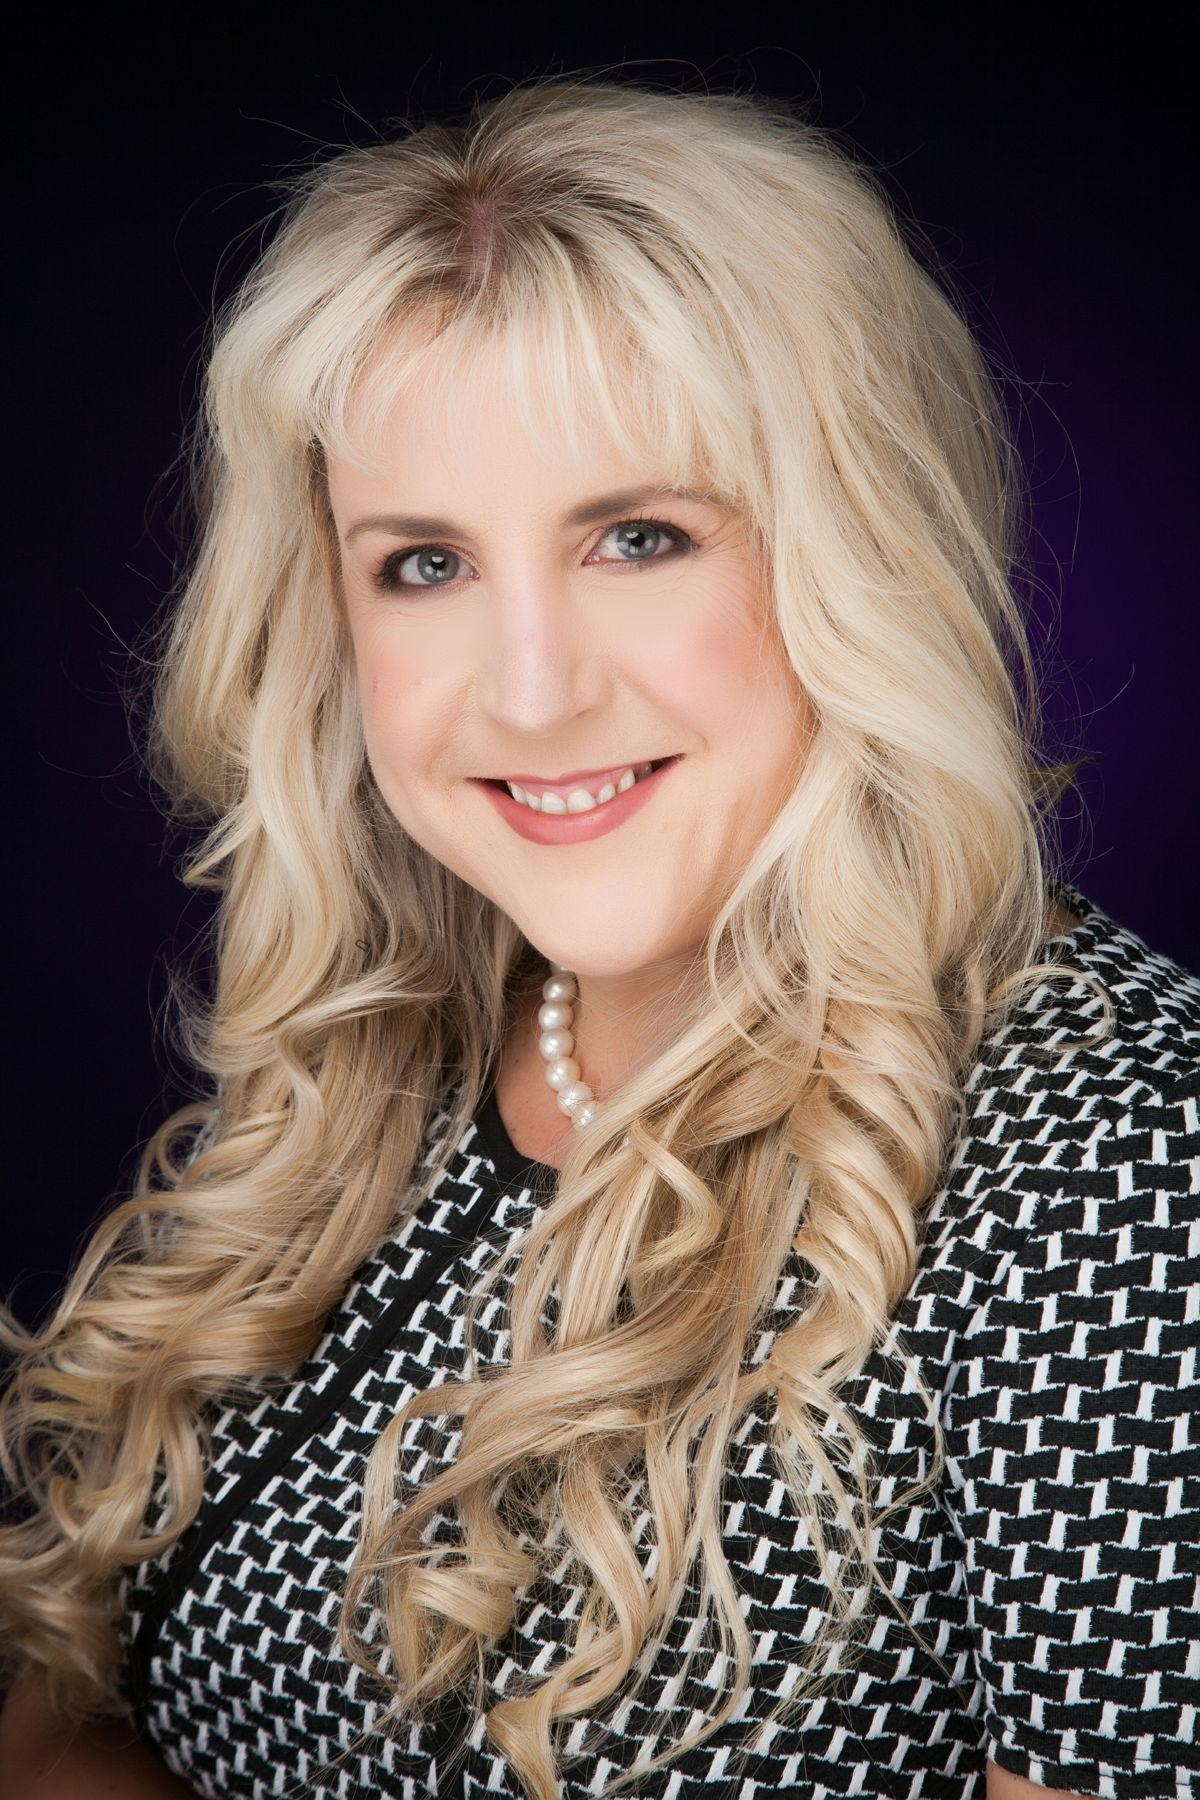 Denise O'Leary